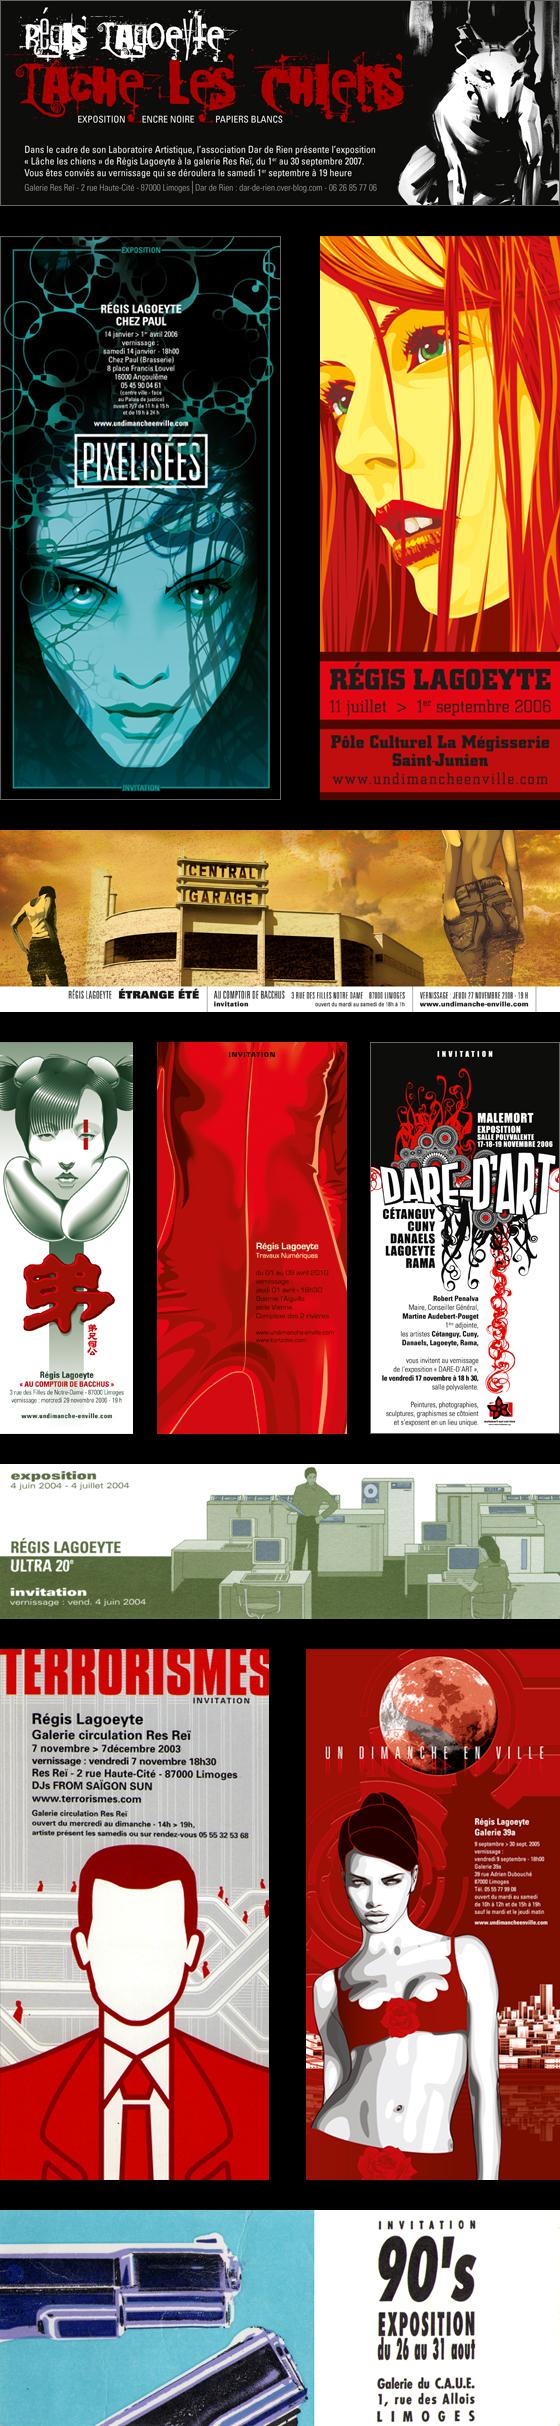 Carton d'expositions by Régis Lagoeyte